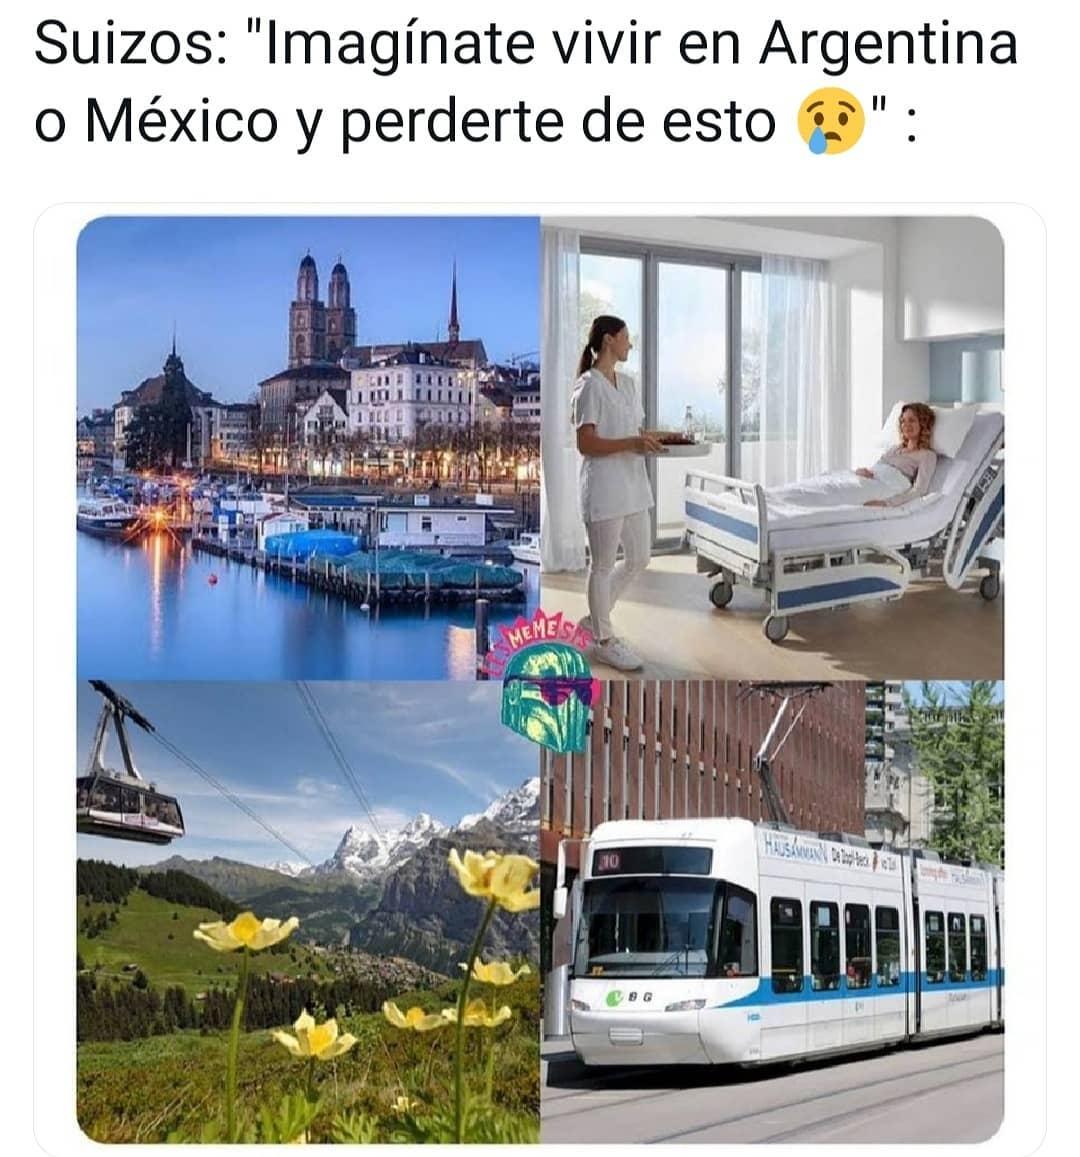 Suizos: Imagínate vivir en Argentina o México y perderte de esto.